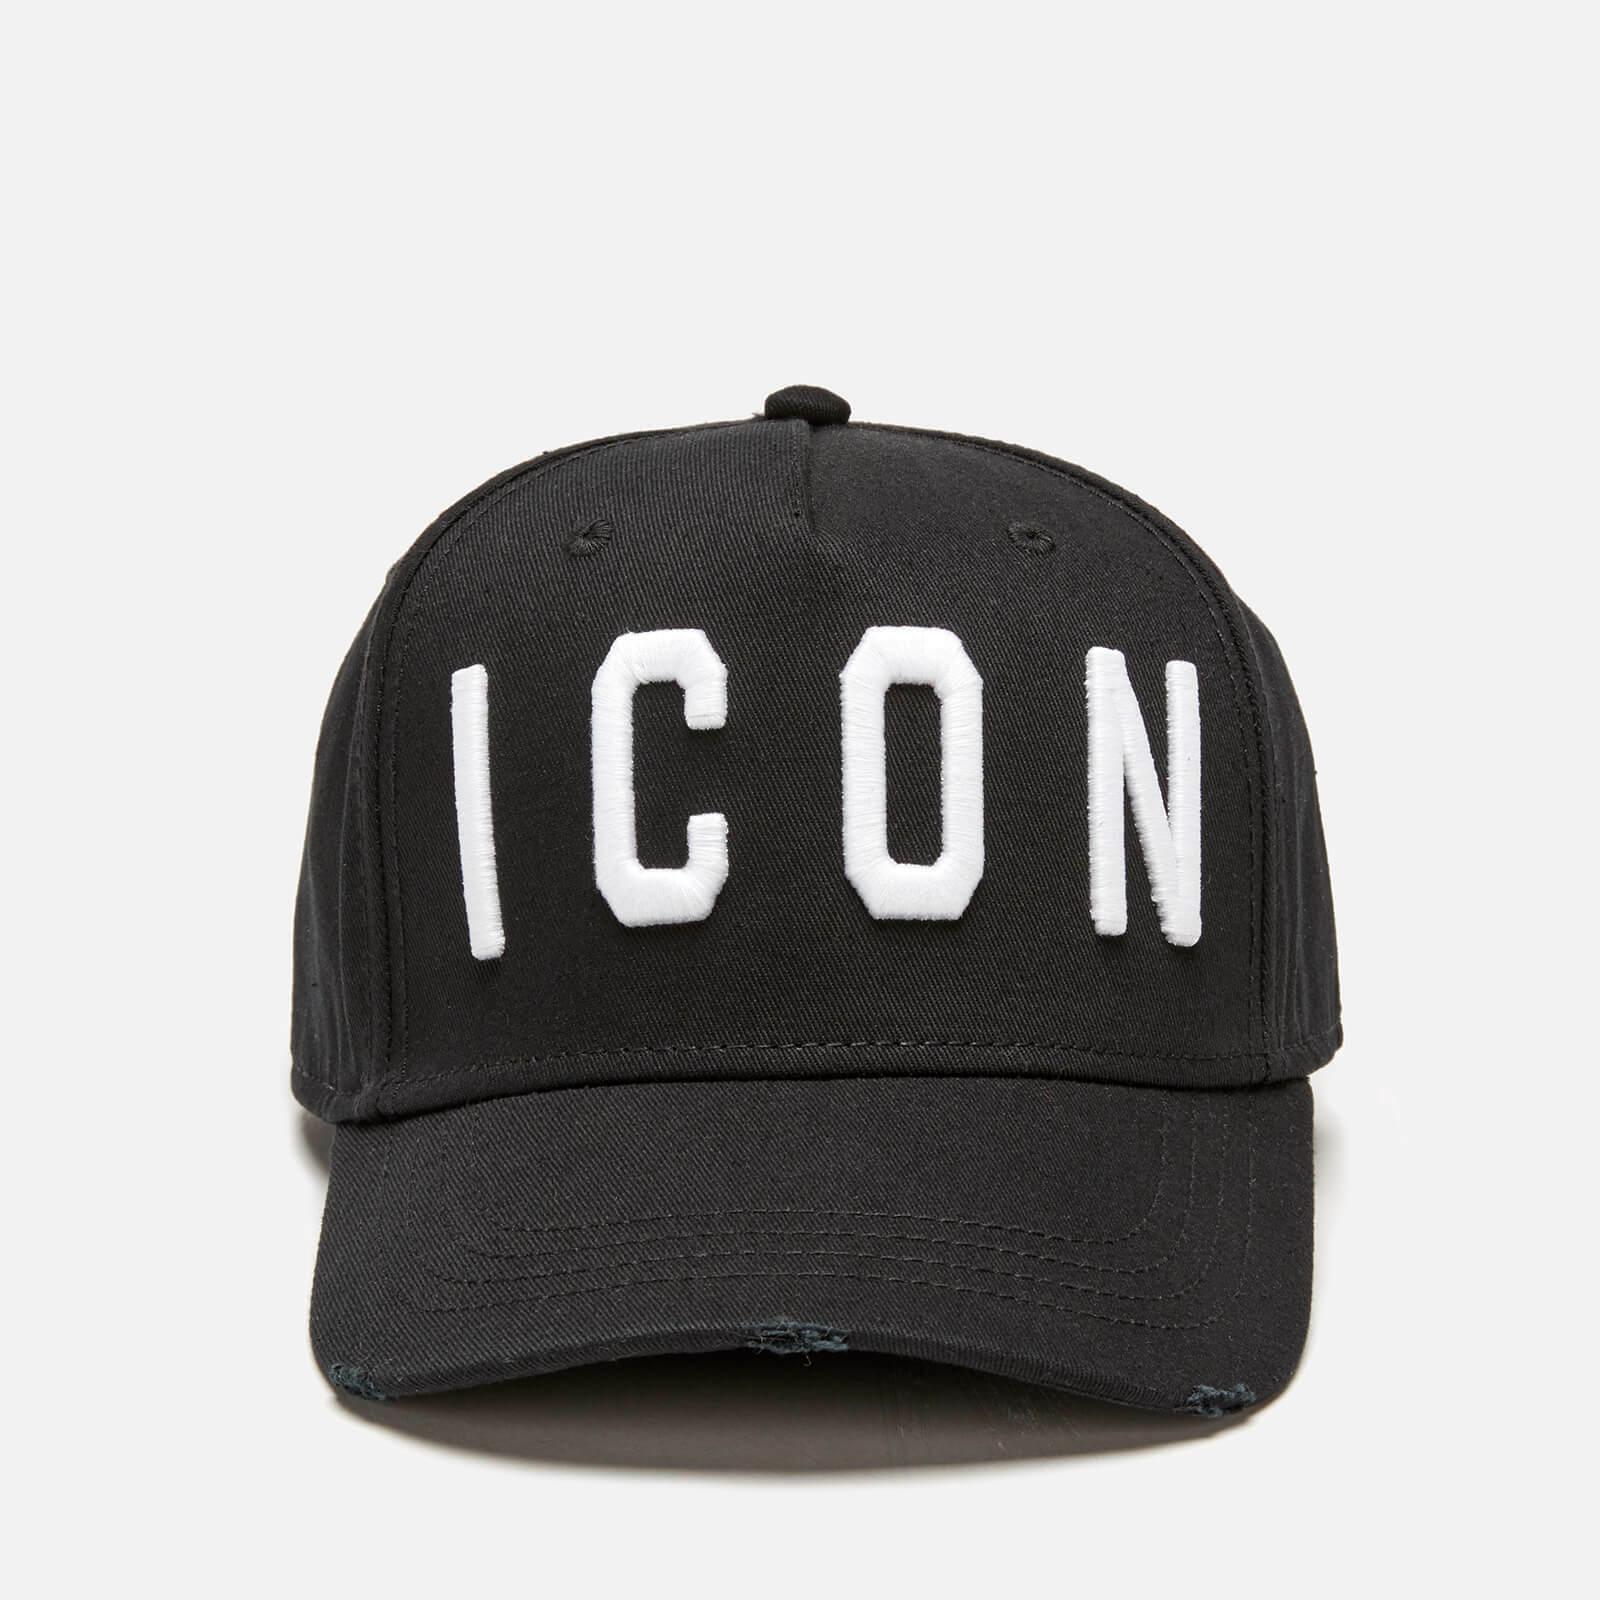 bbef92534 Details about Dsquared2 ICON Black Snapback Baseball Cap ONE SIZE Men &  women Unisex Hat (W)